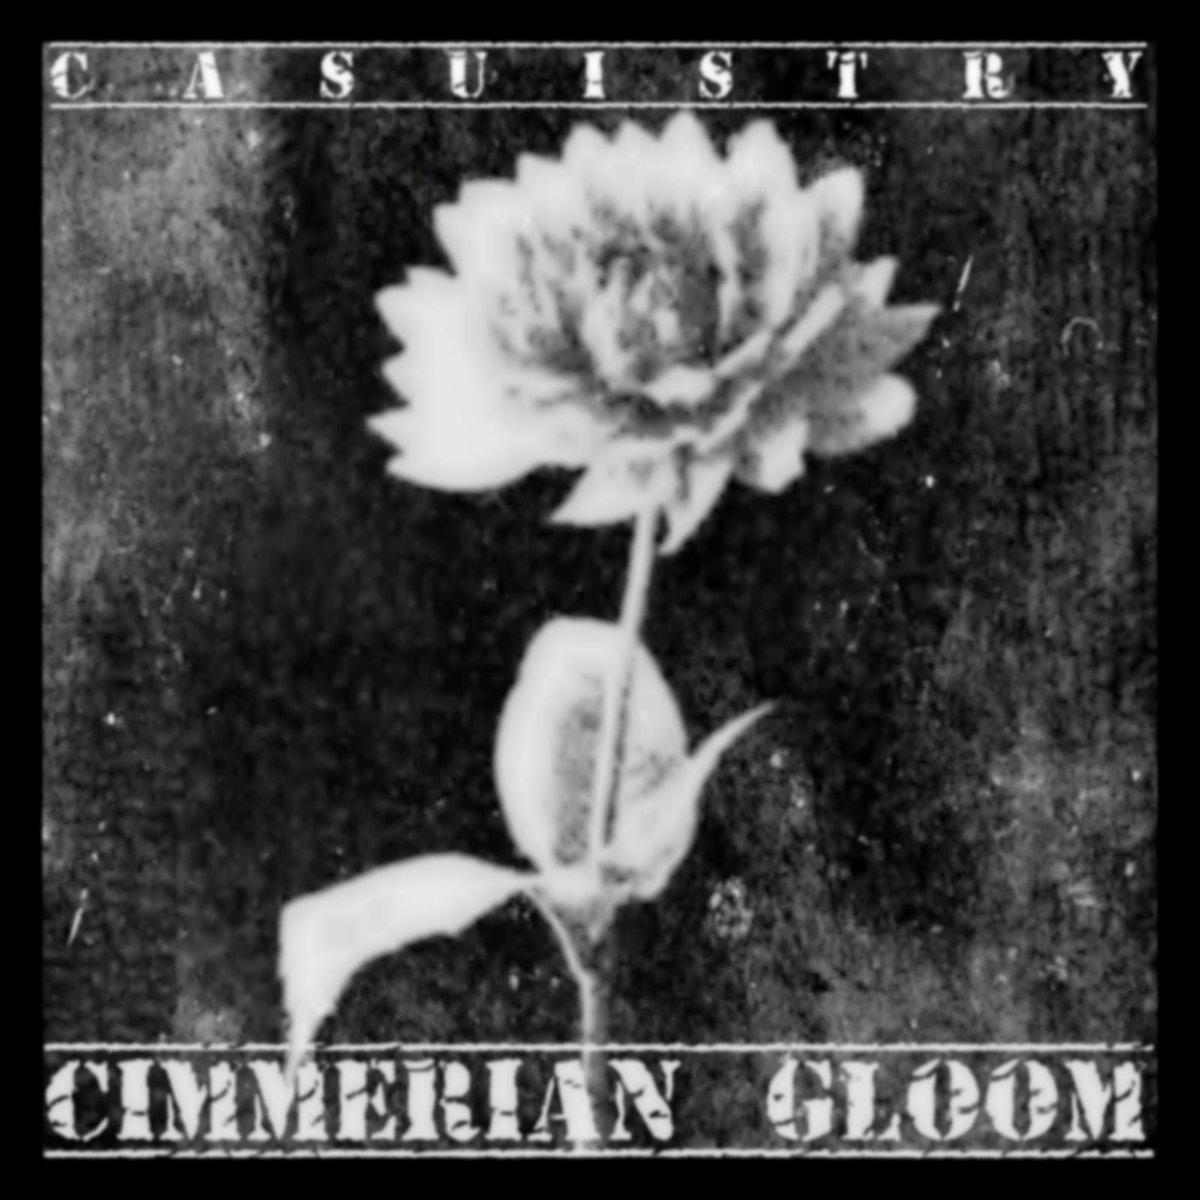 Casuistry - Cimmerian Gloom (LP; 2016)